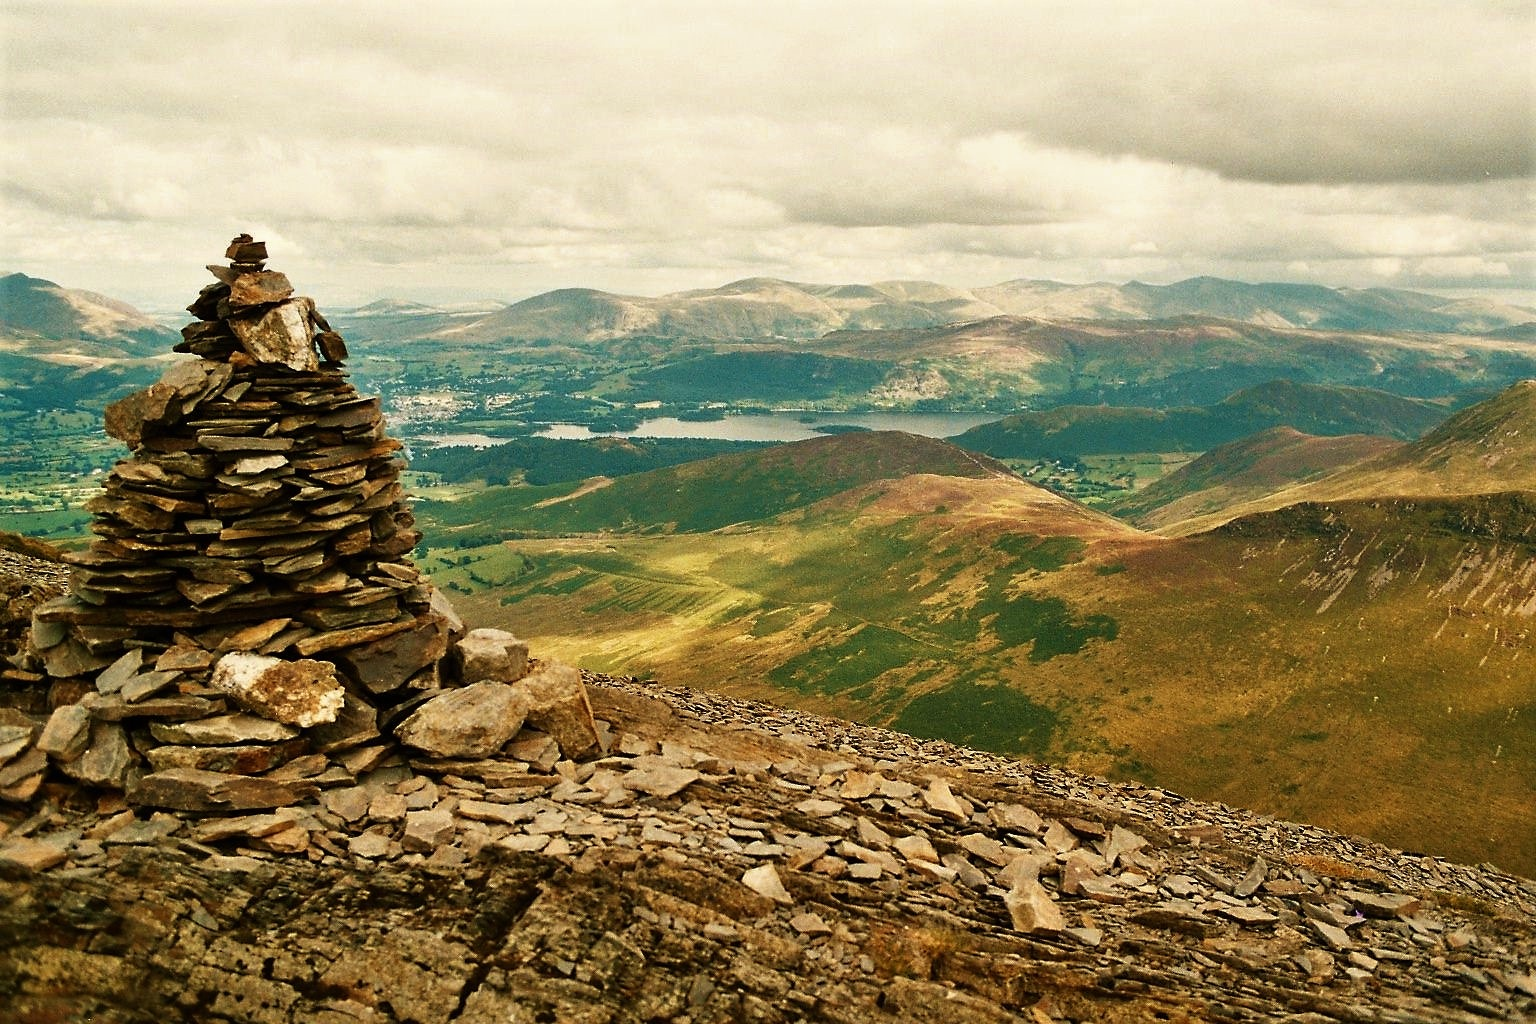 Cairn view by AJ Yakstrangler Andy Jamieson